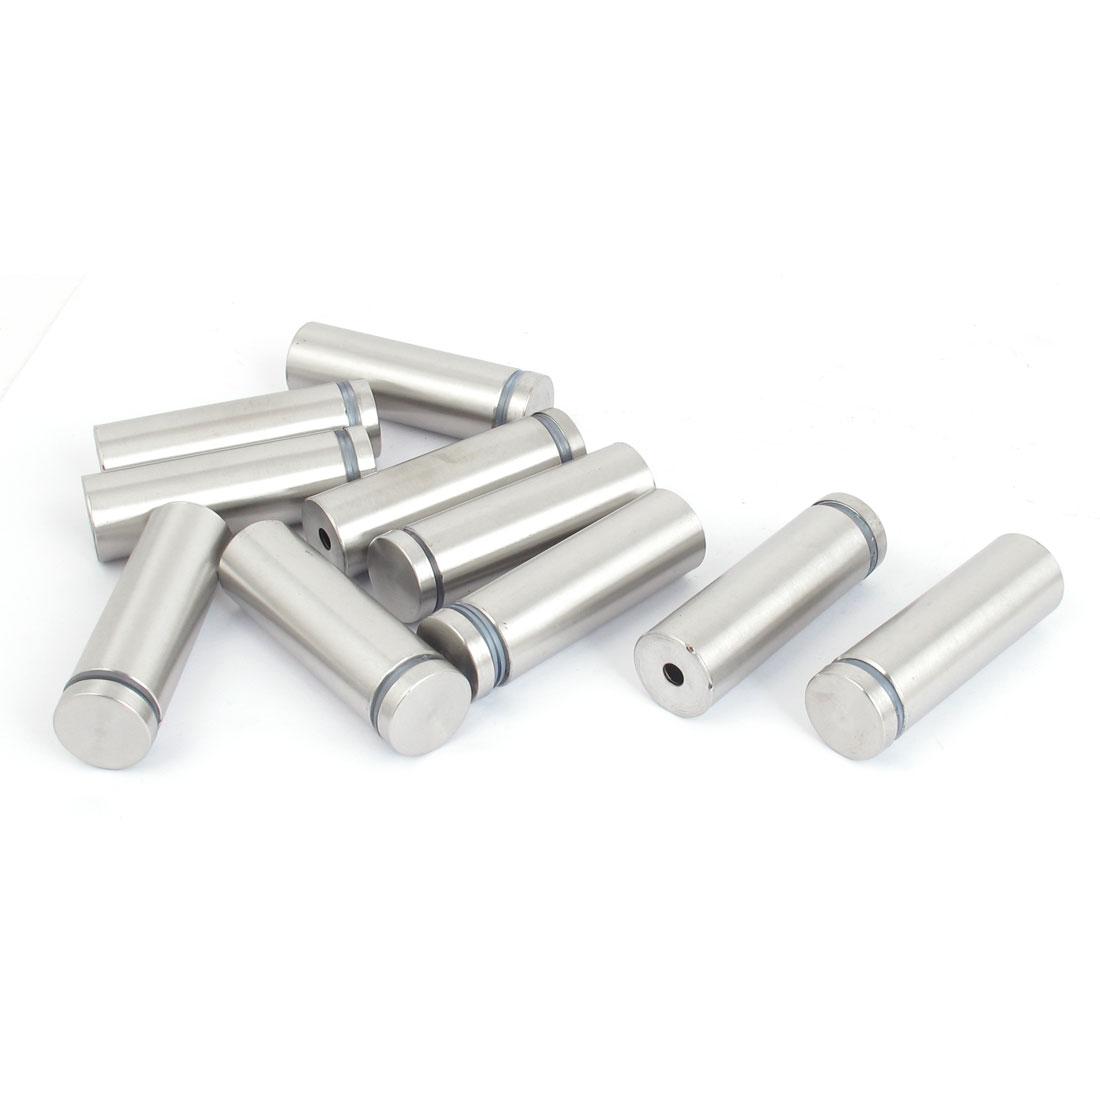 19mm x 60mm Stainless Steel Advertising Frameless Glass Standoff Pins 10pcs